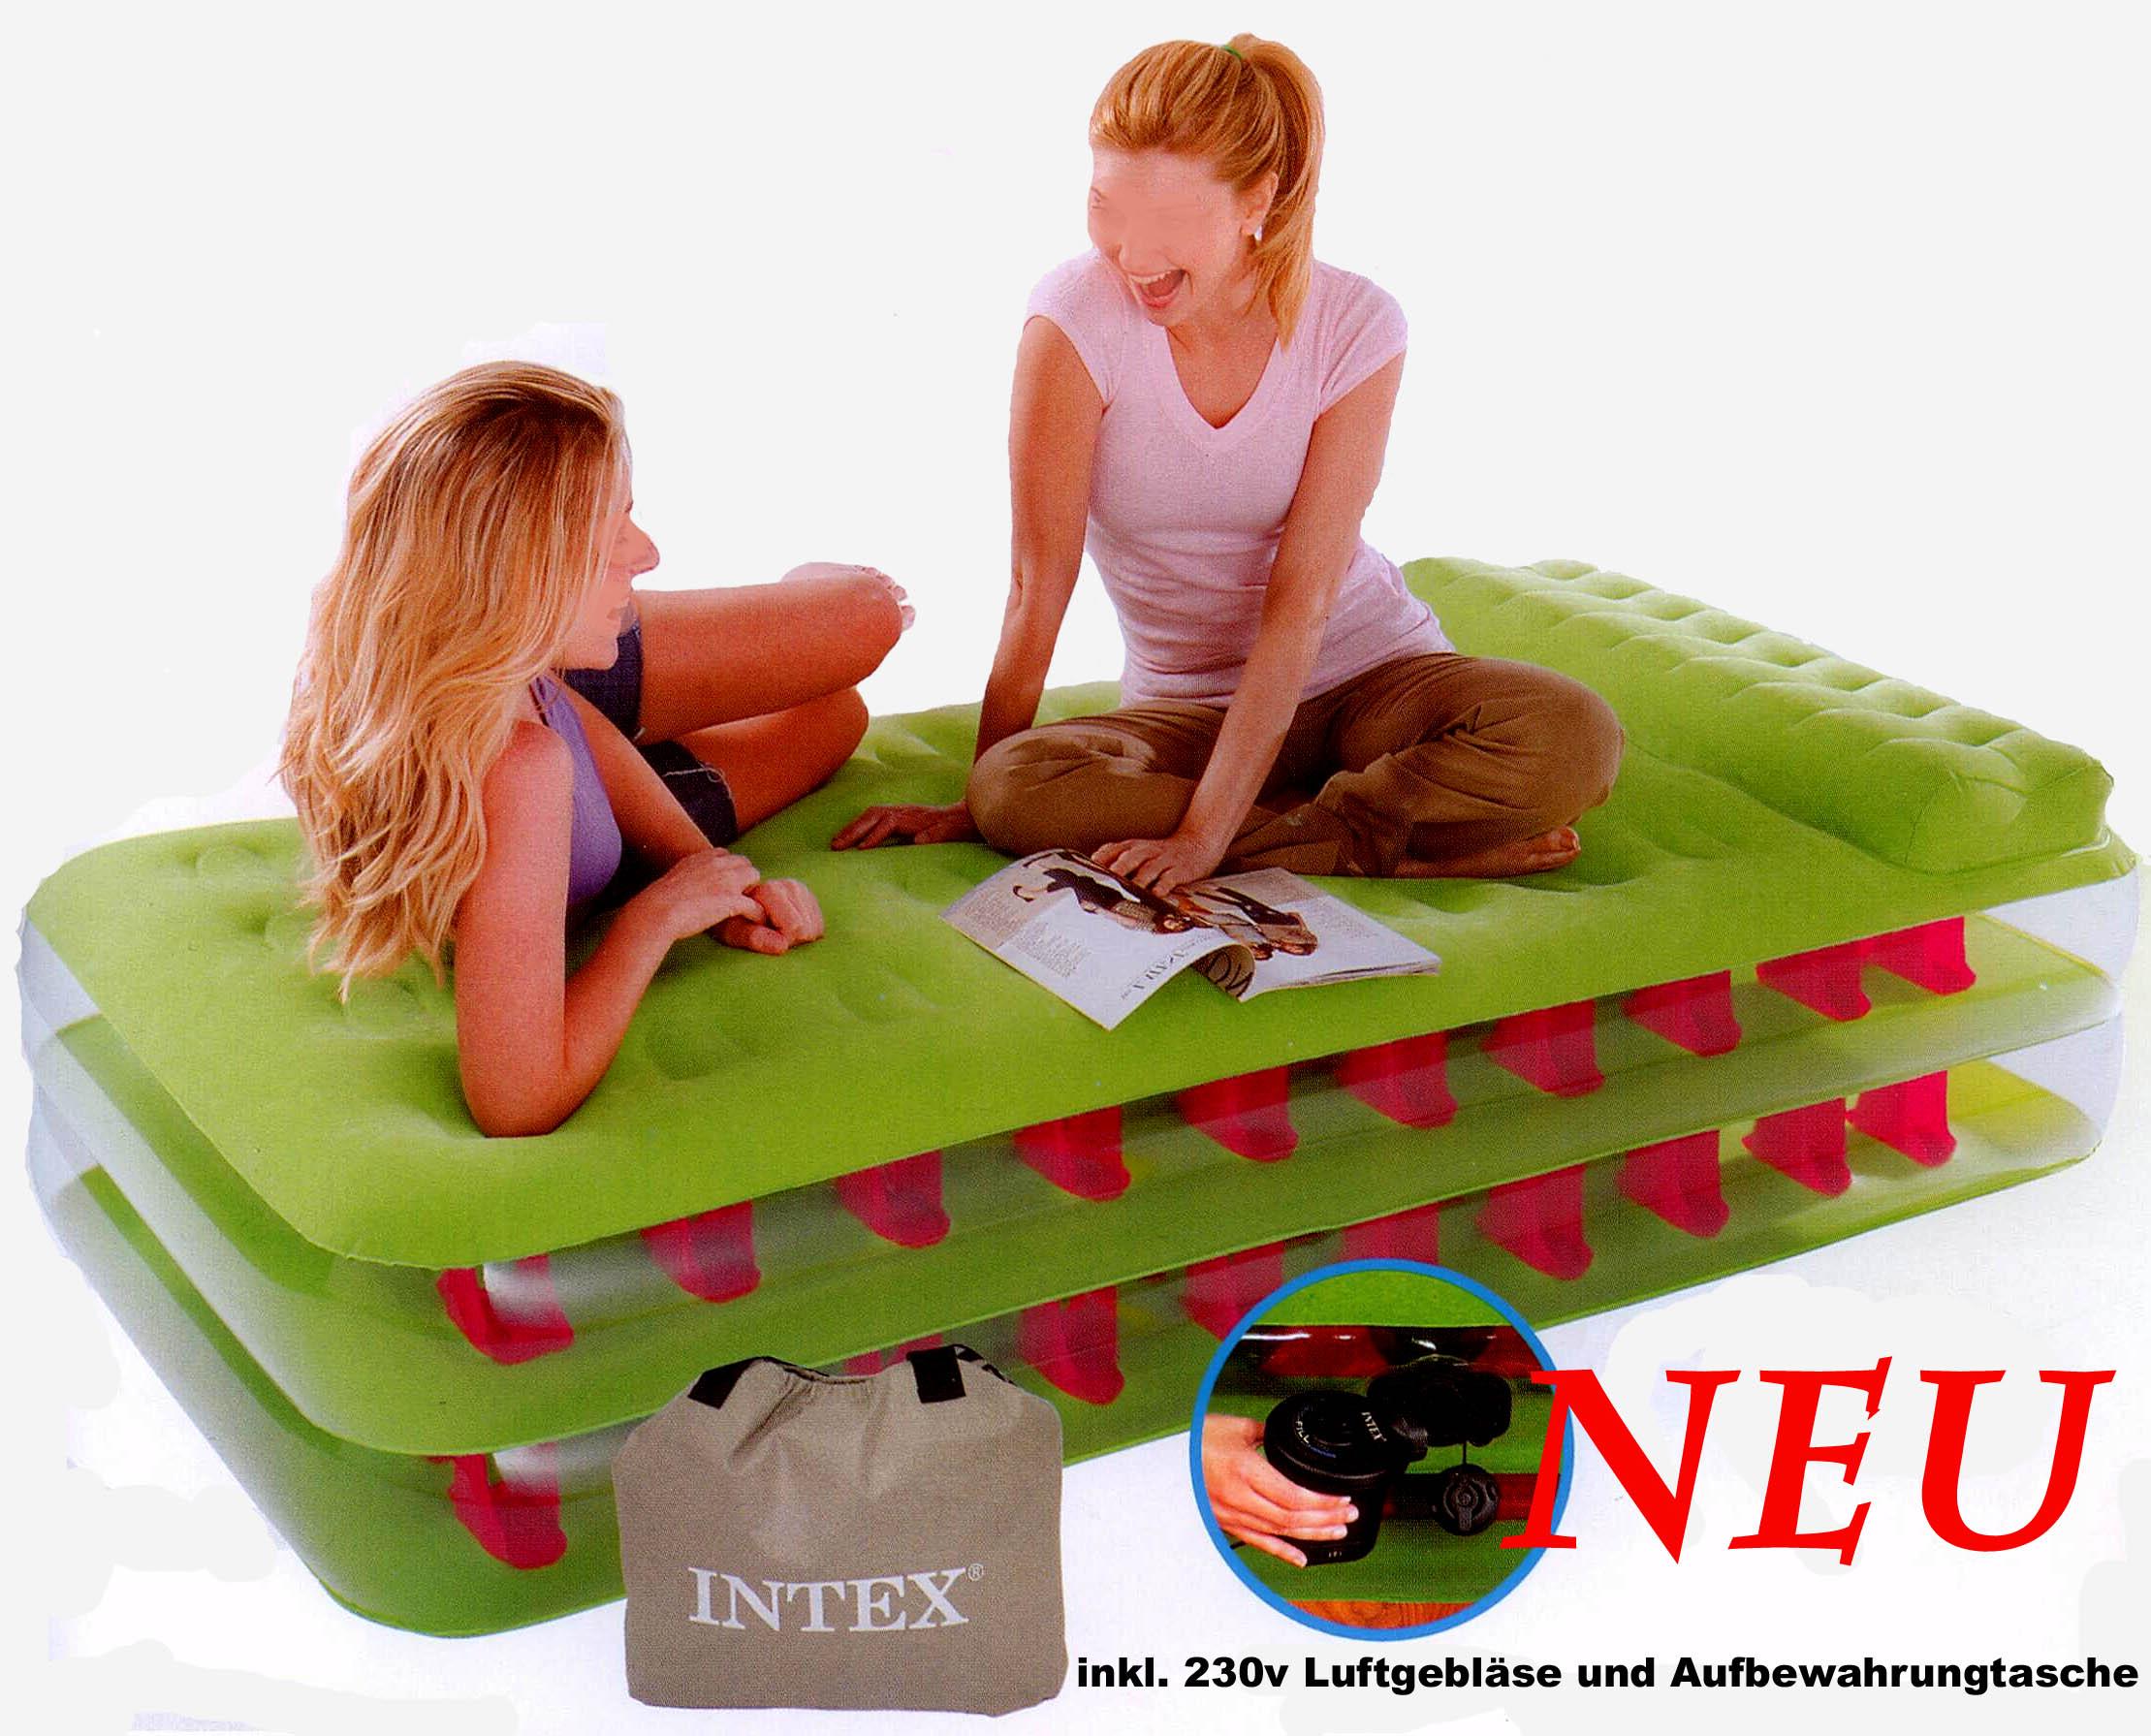 Intex Luftbett 191x99x47 cm Gästebett Bett elektrische Pumpe